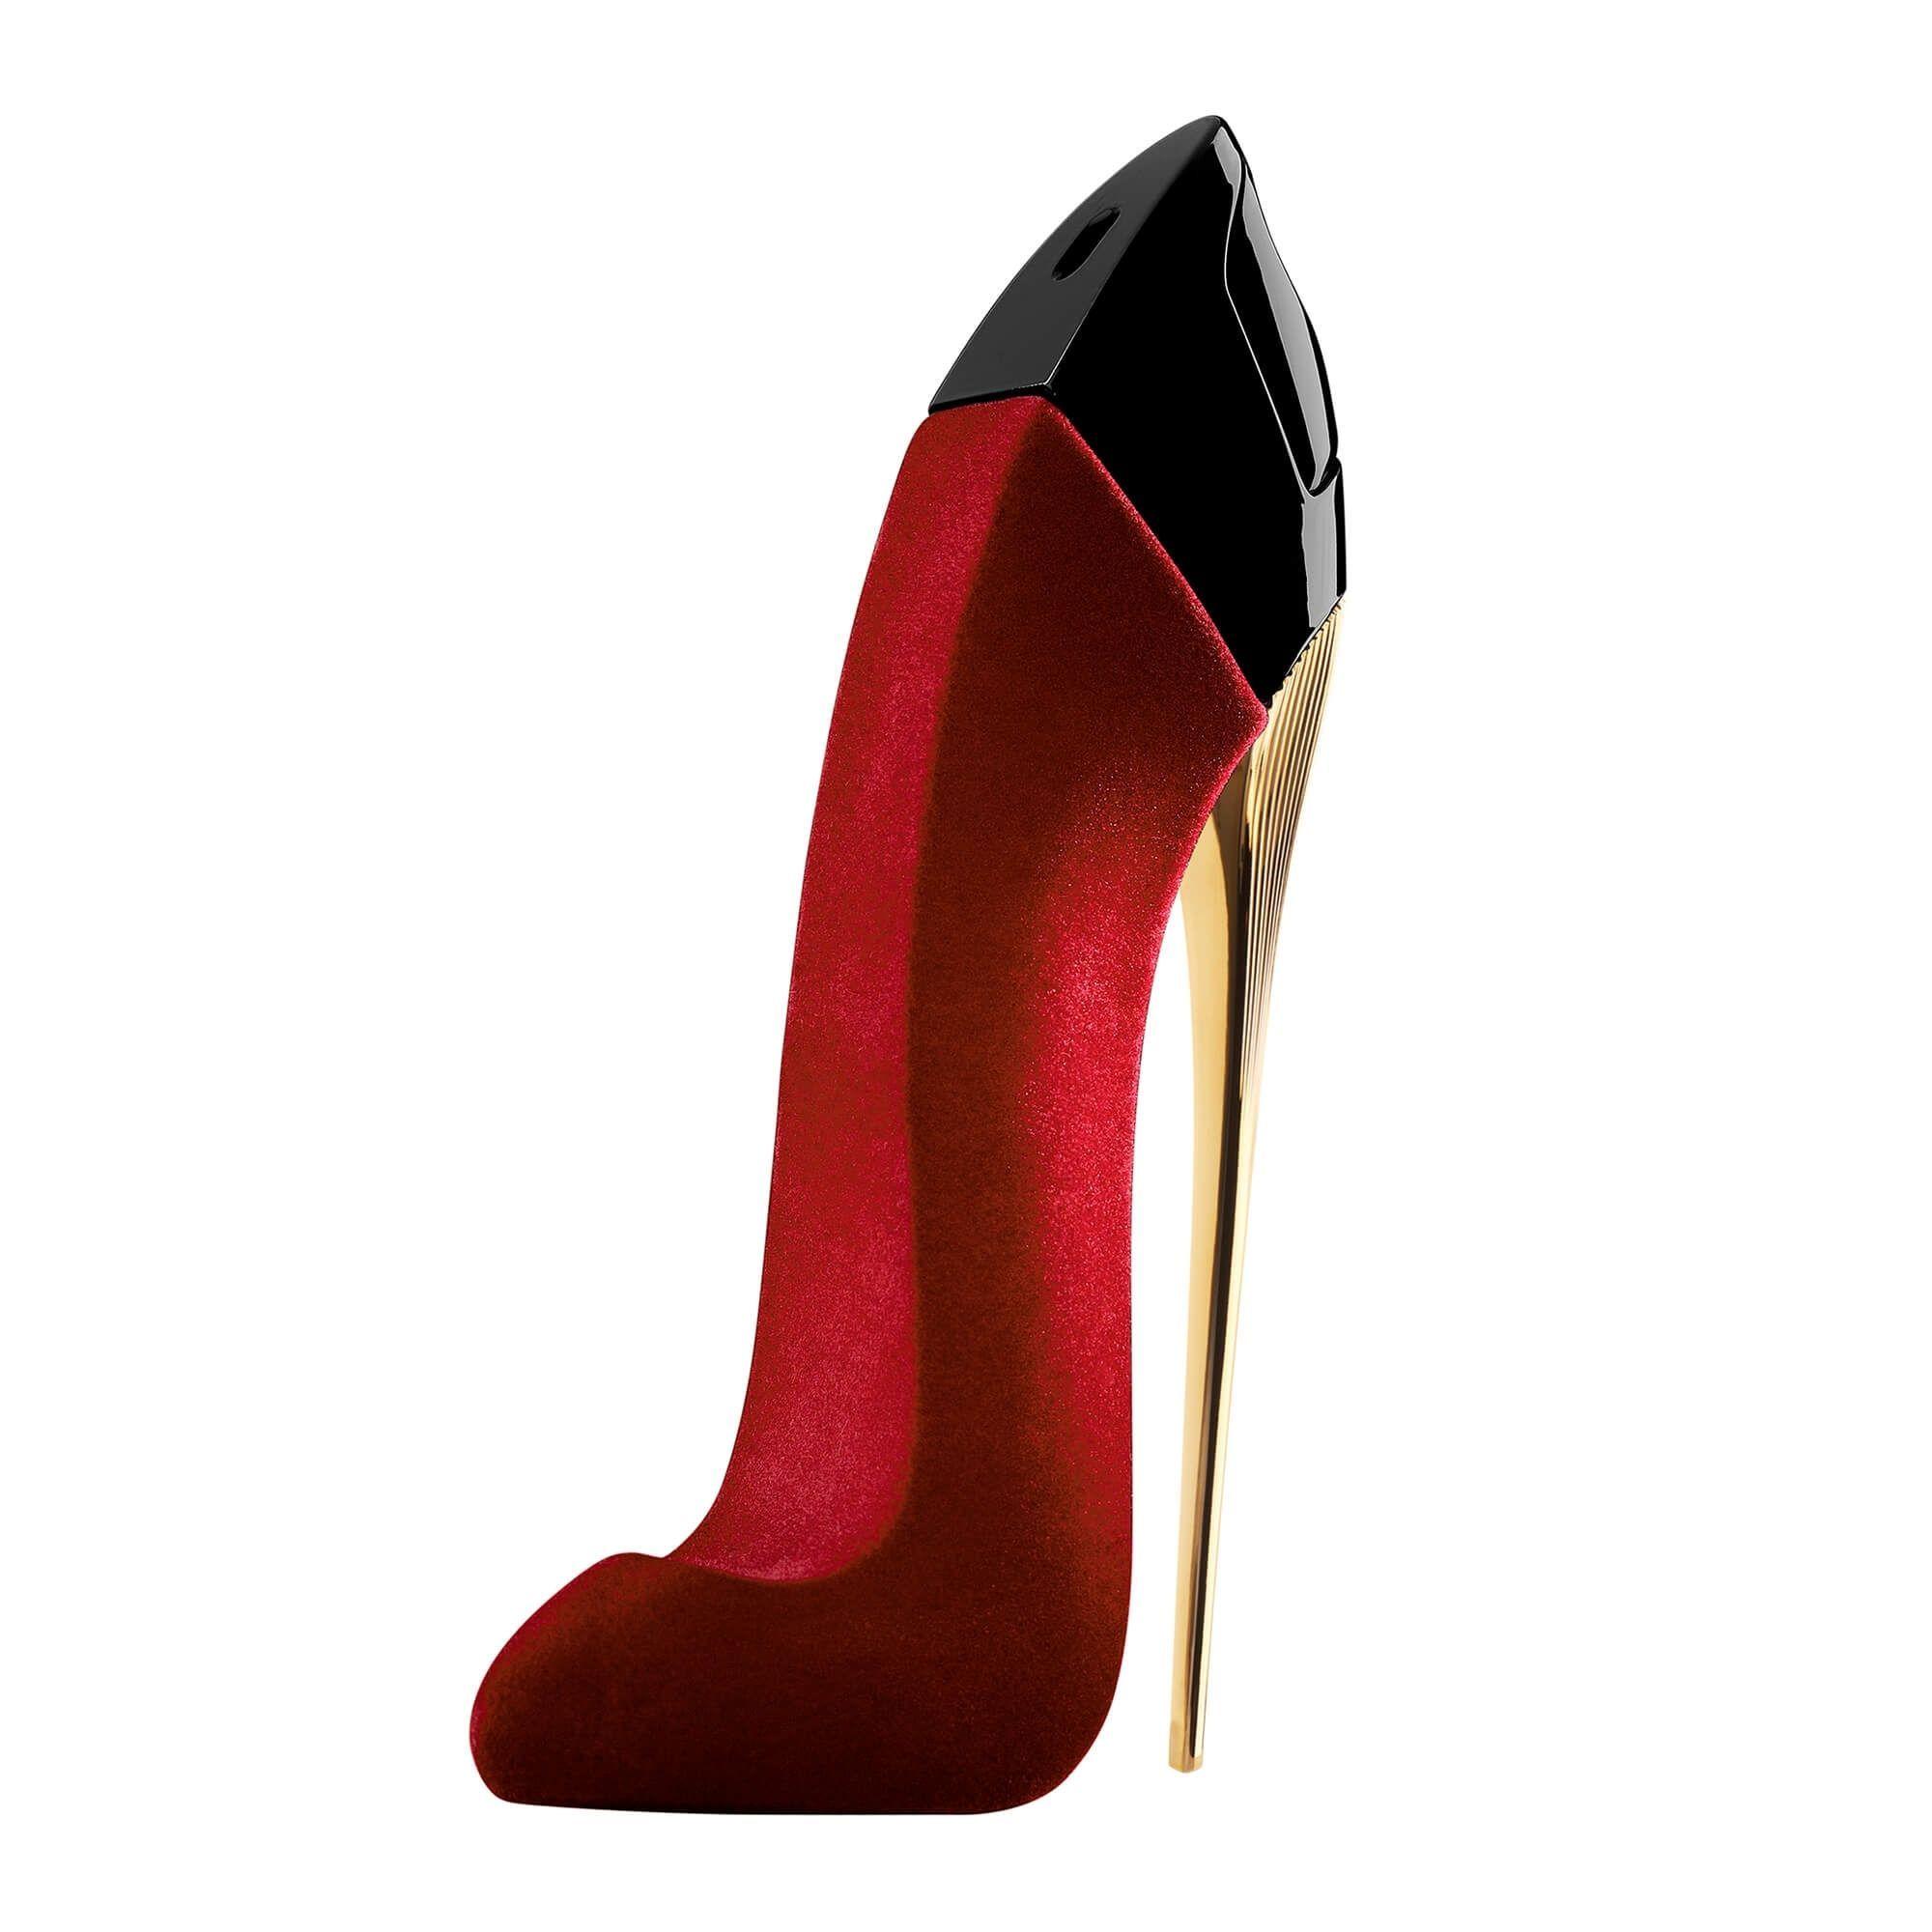 Perfume Carolina Herrera Good Girl Collector Edition Velvet Fatale Feminino  Eau de Parfum Sabe como t… | Good girl perfume, Luxury perfume, Beautiful perfume  bottle